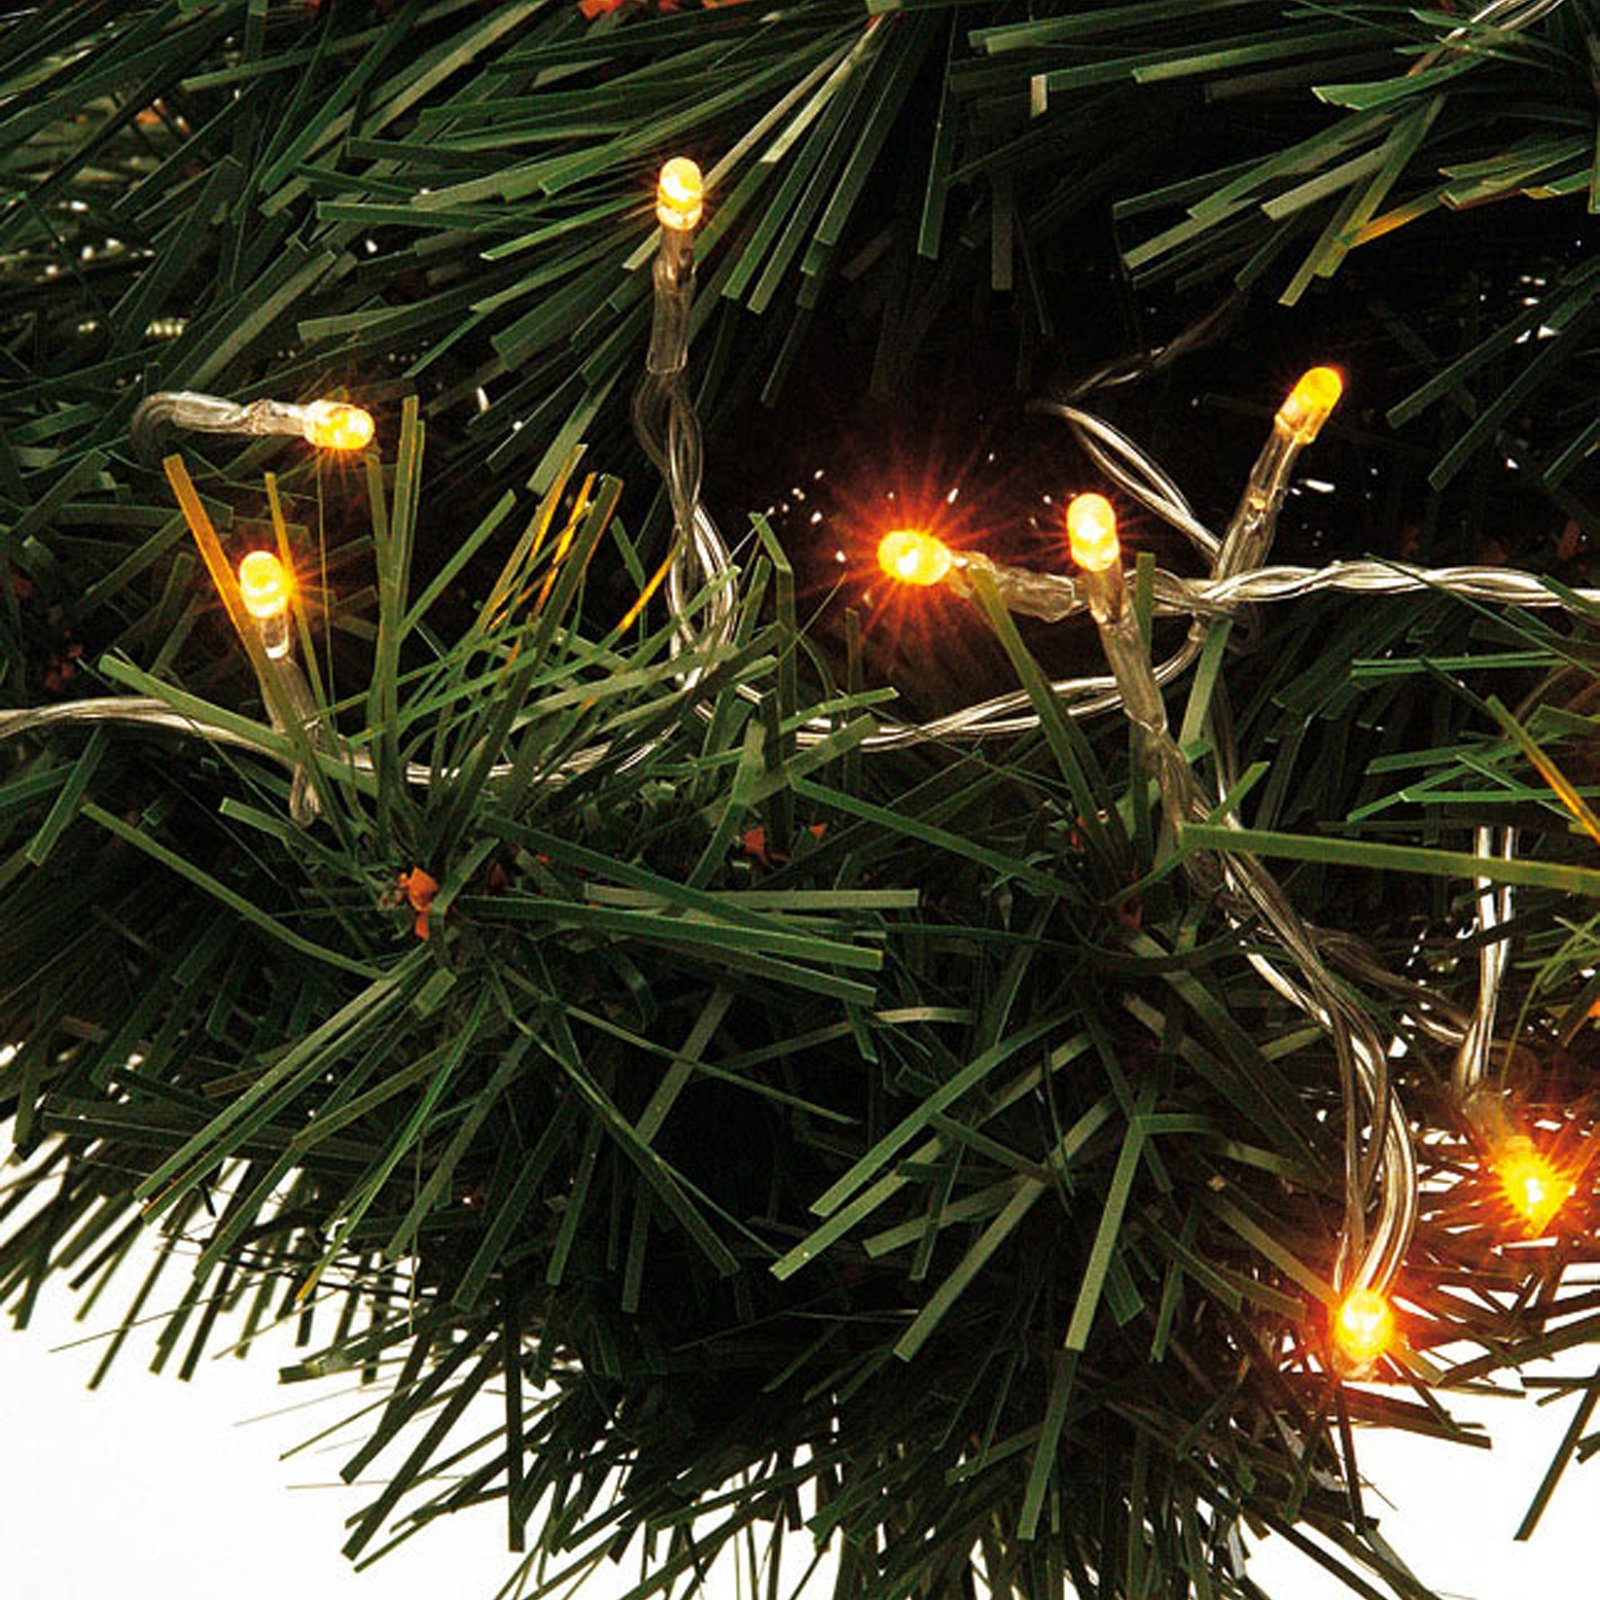 LED-Mini-Lichterkette - warmweiß - 150 cm